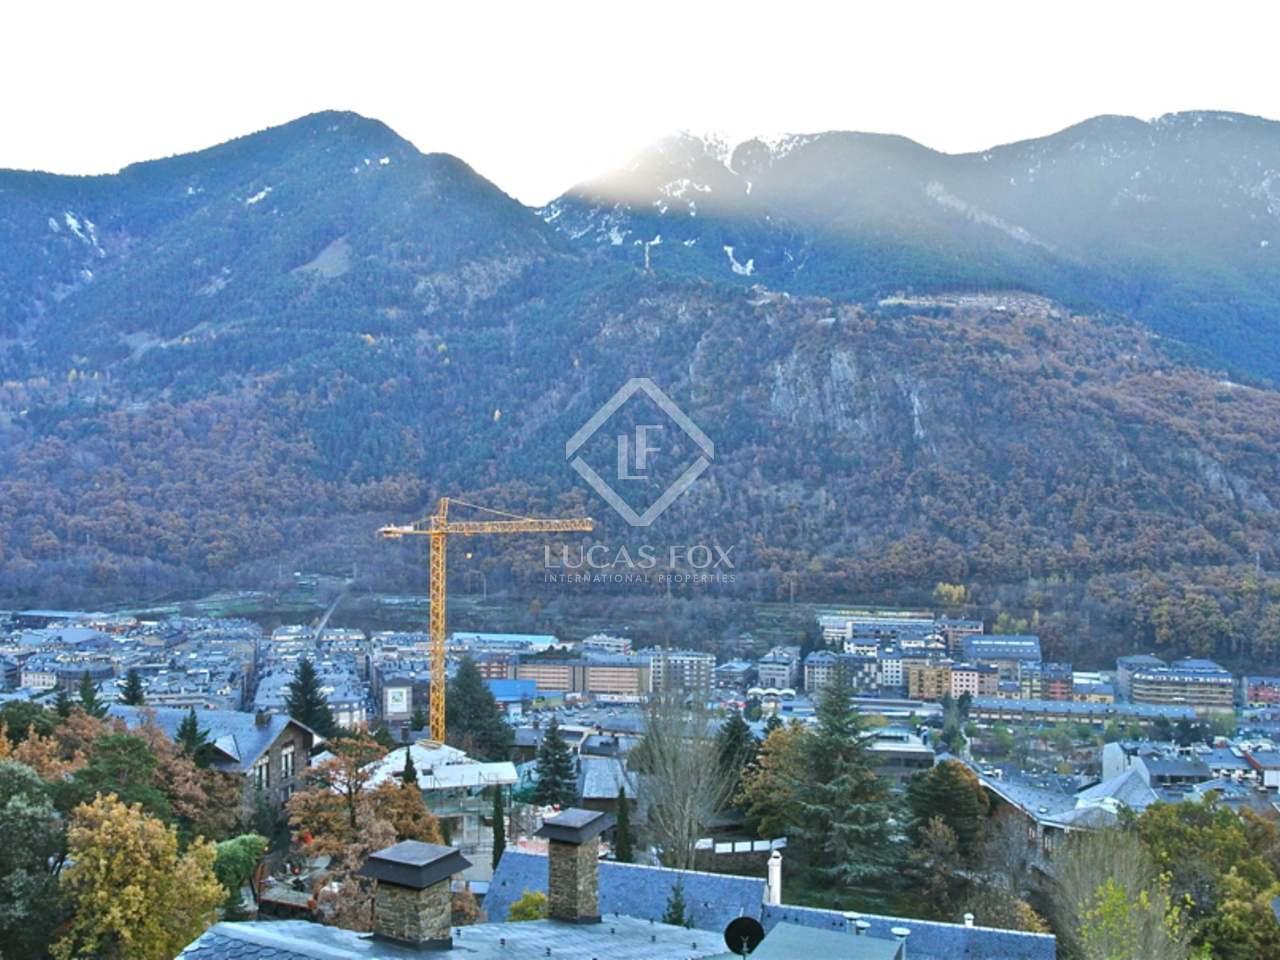 3 Bedroom Apartment For Sale In Andorra La Vella